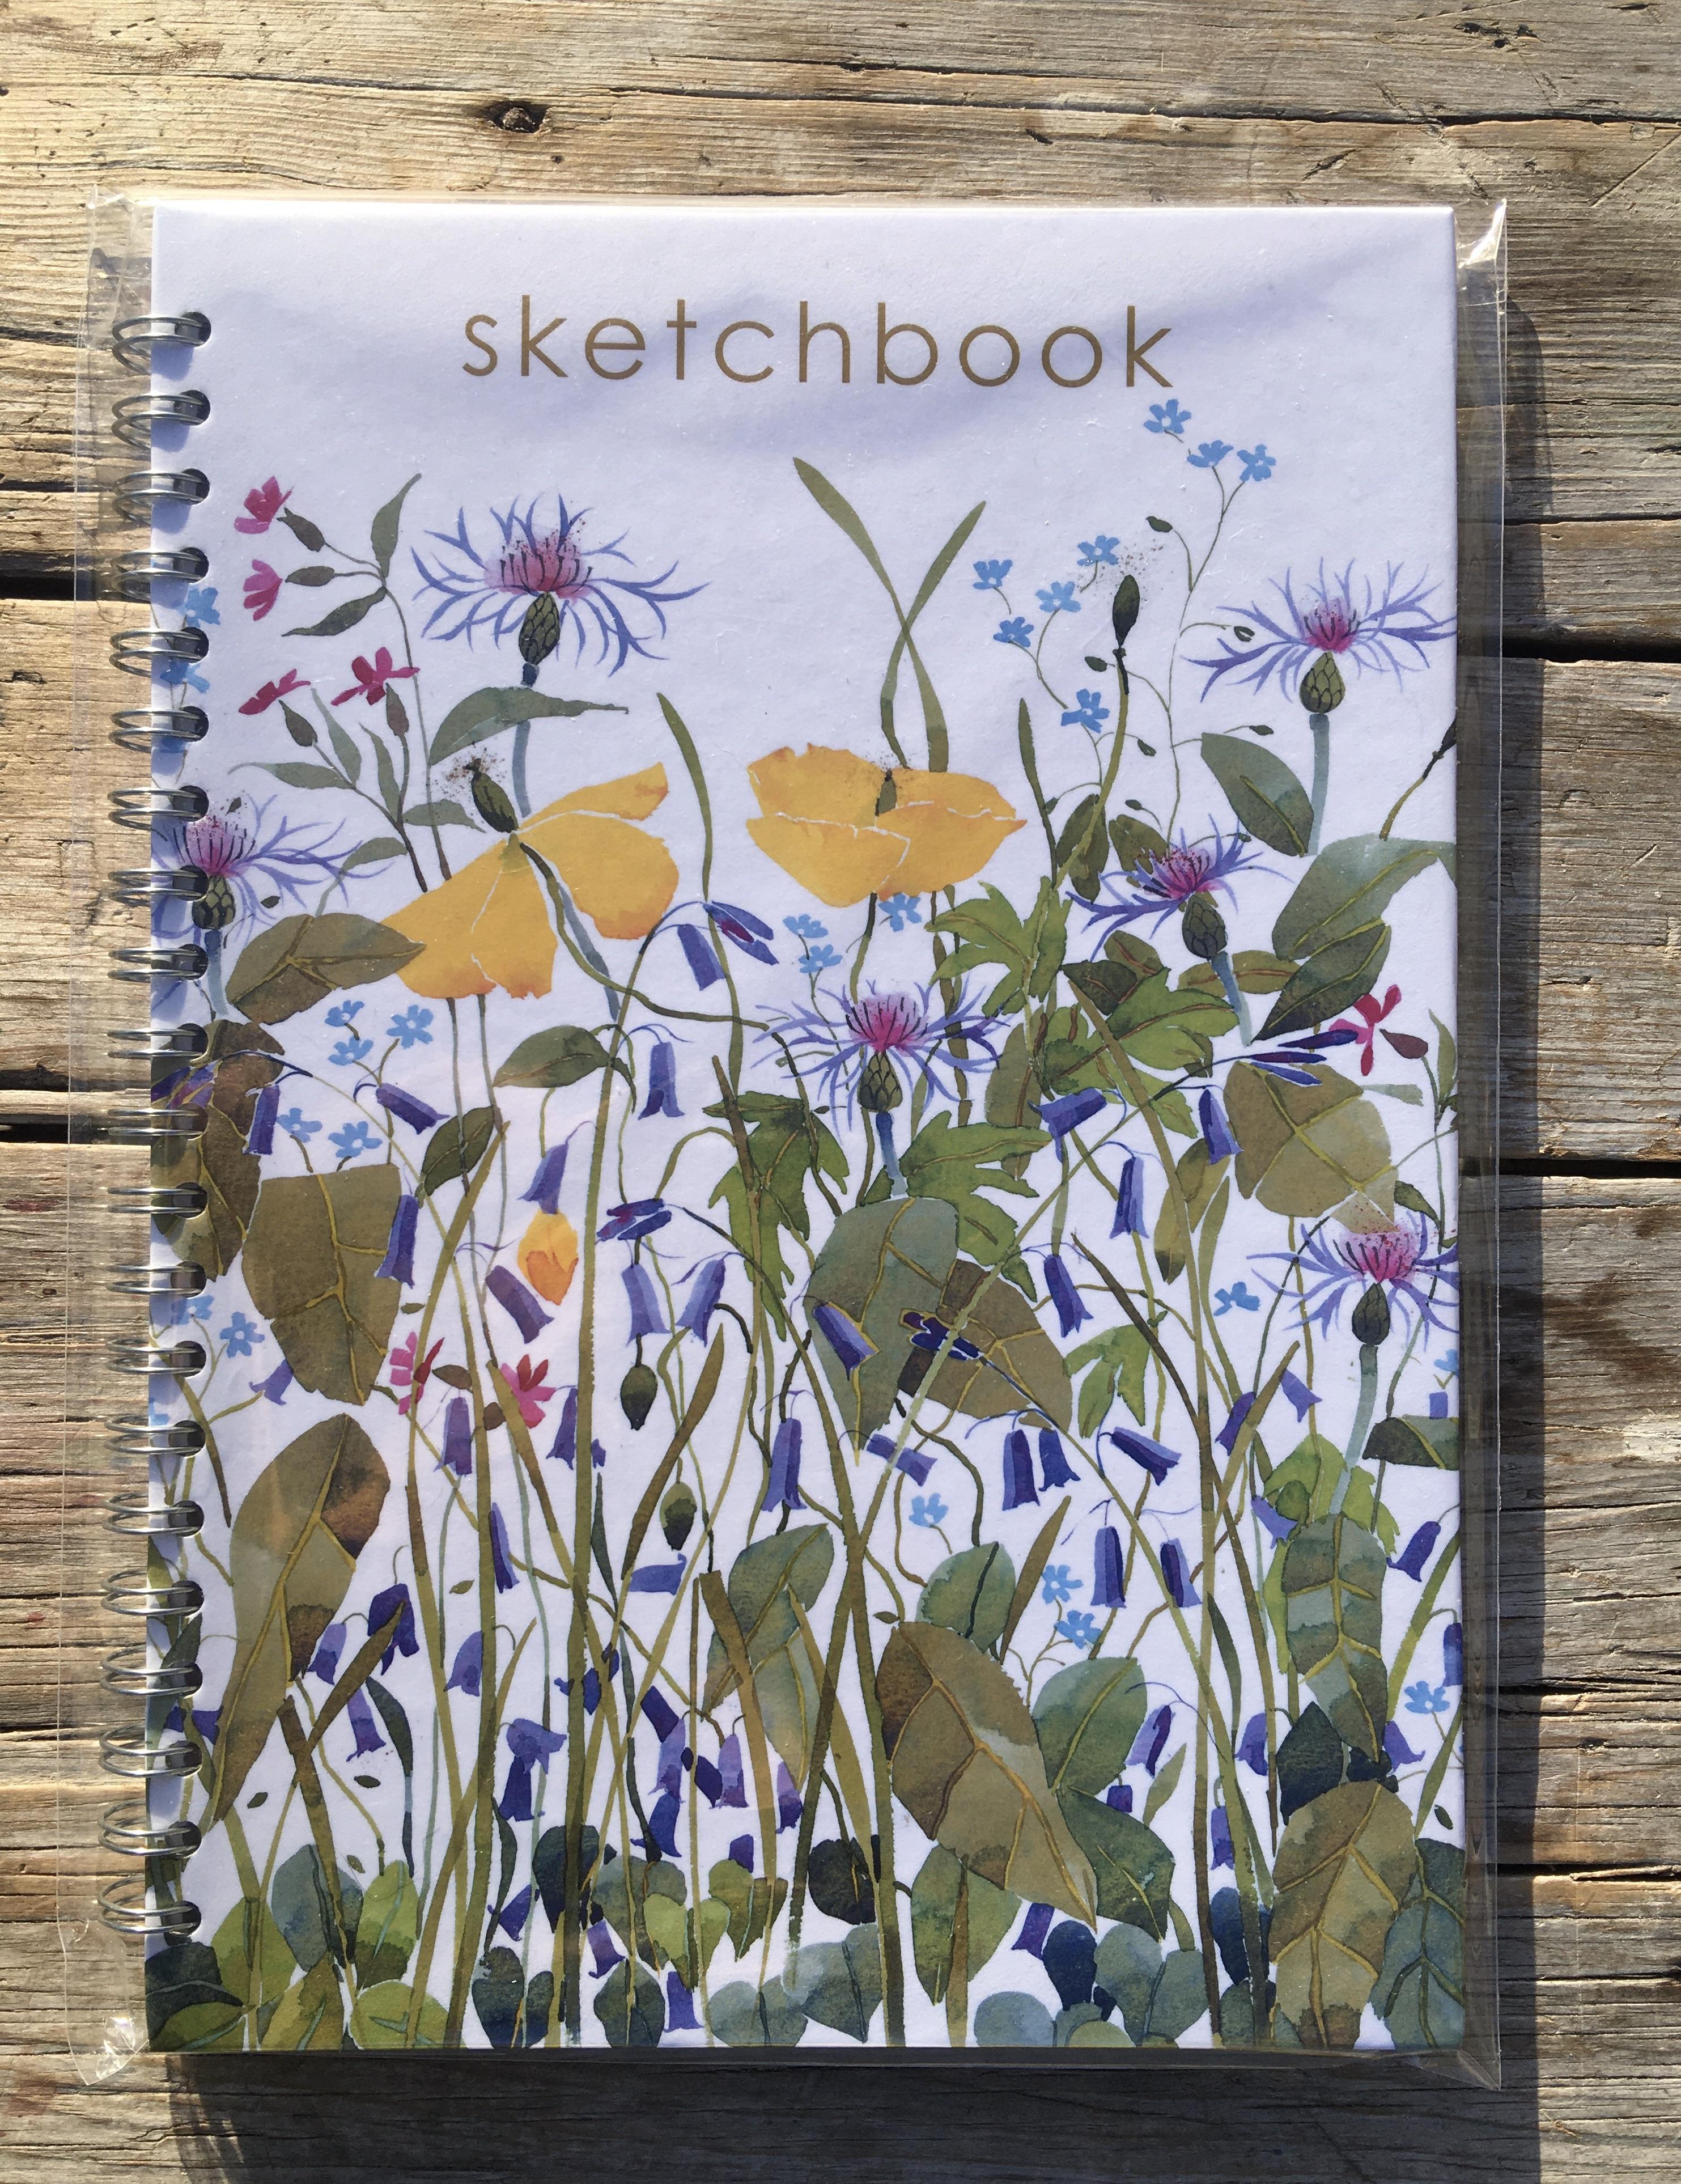 Sketchbook, Spring Flowers image